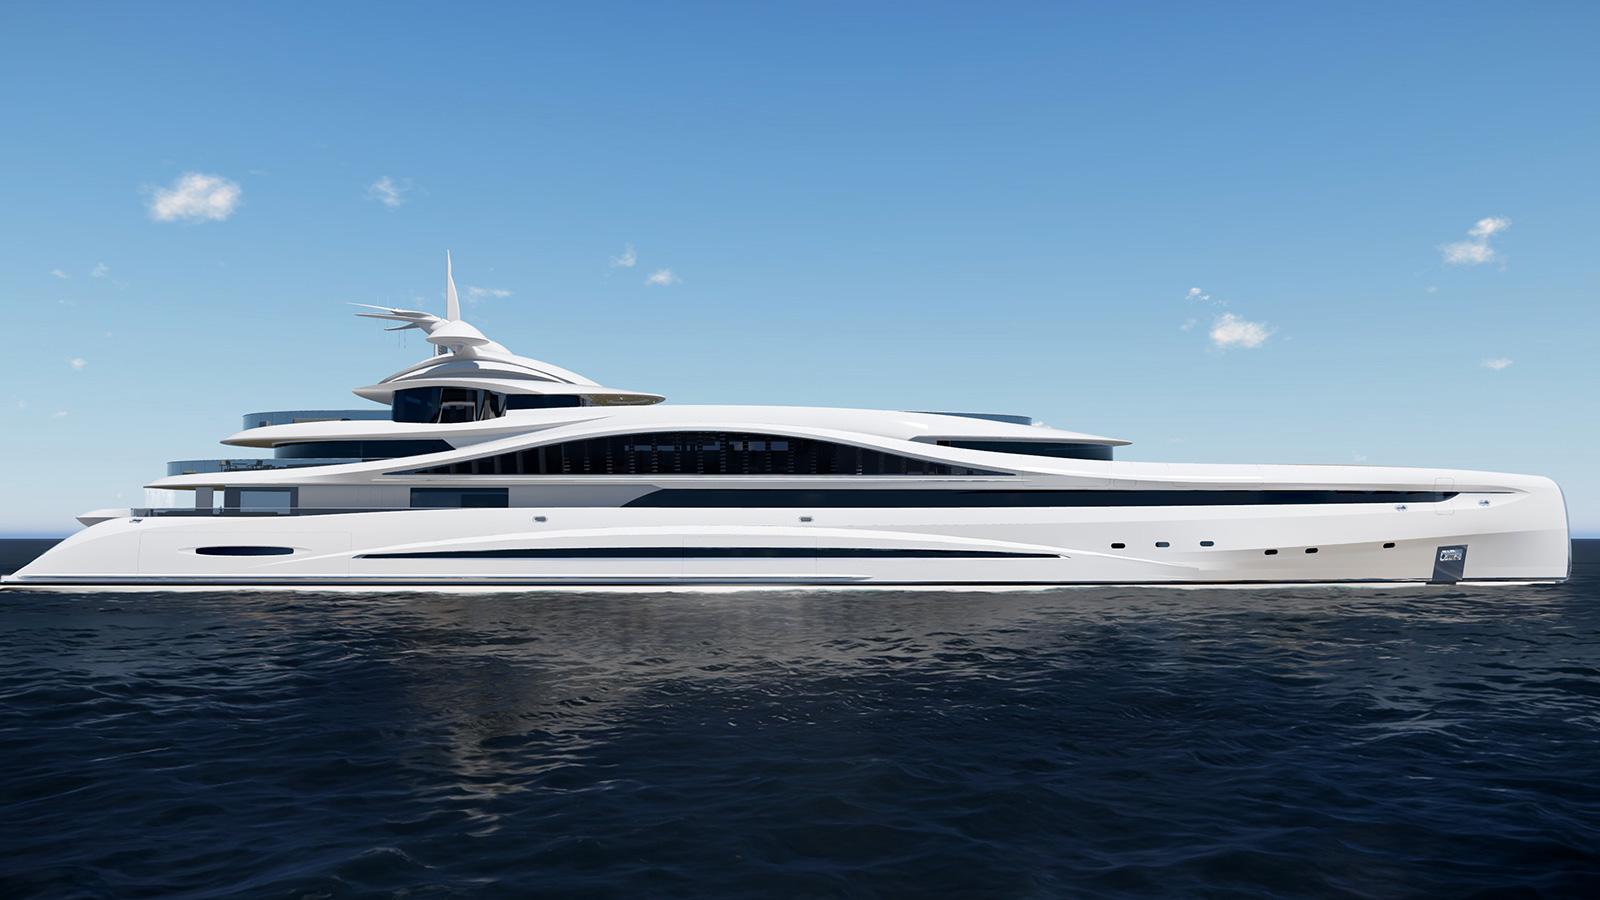 starboard-view-of-90-metre-fincantieri-super-yacht-concept-sundance